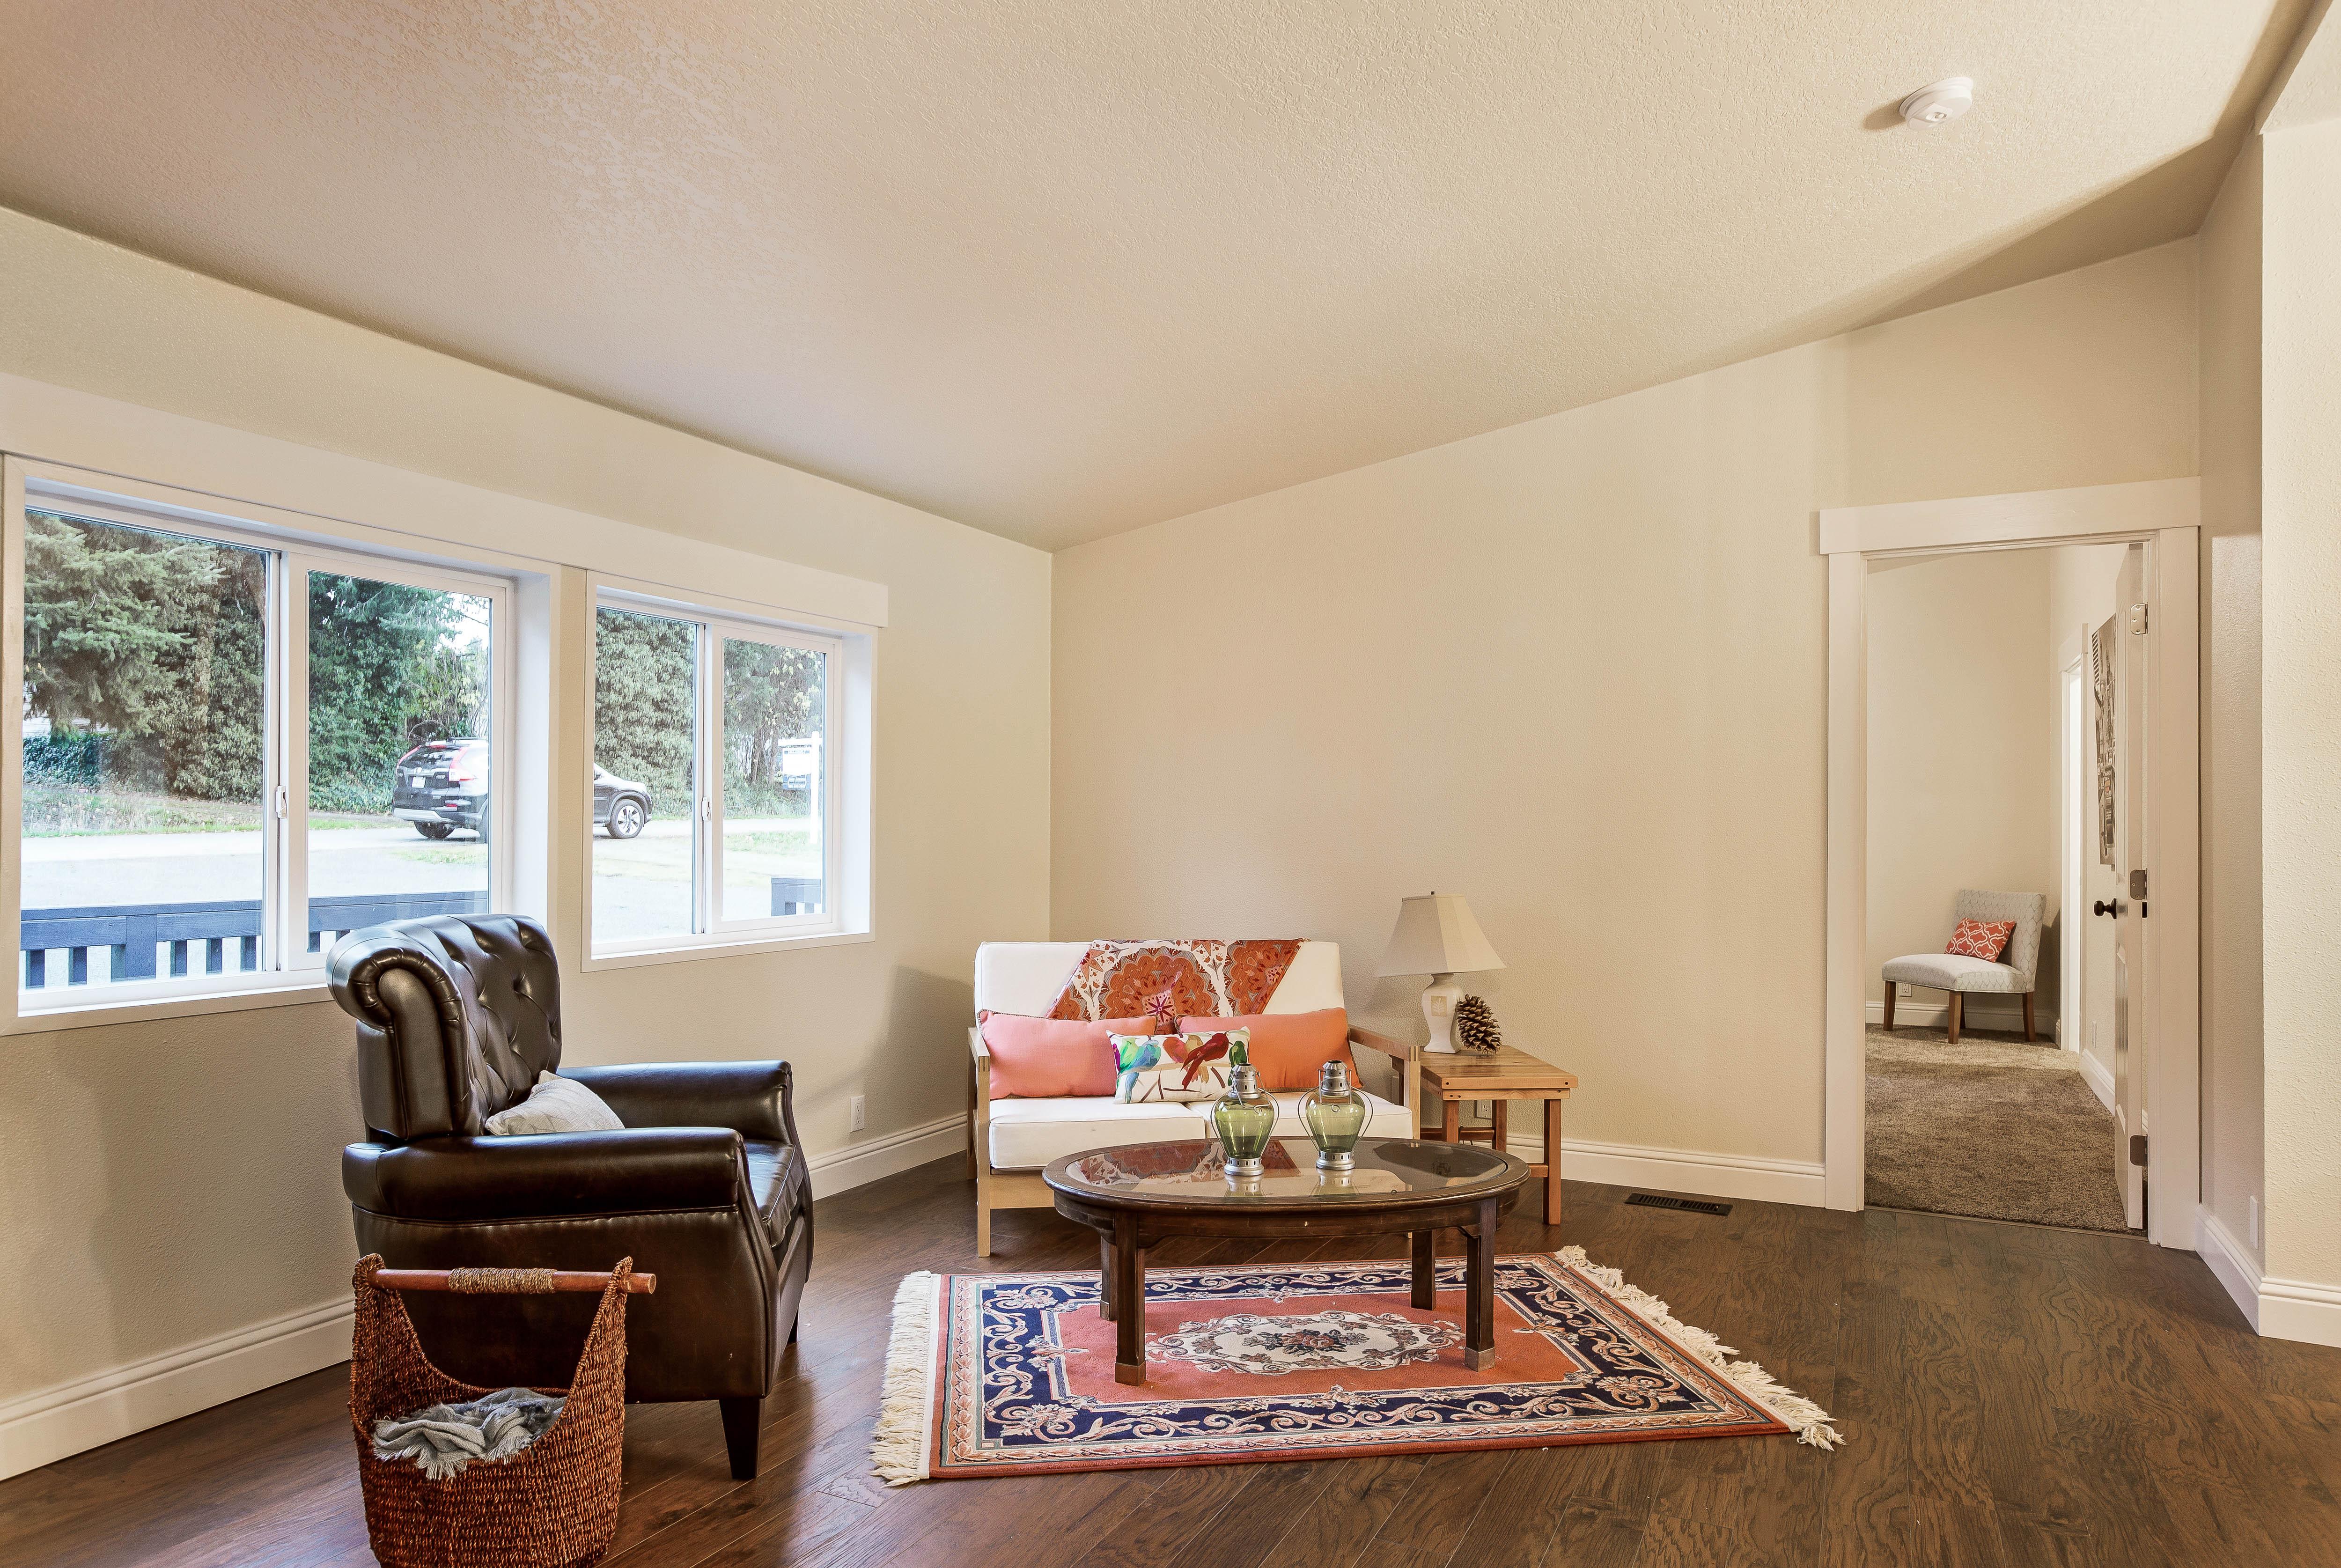 4337 Terrace, Oak Harbor, Whidbey island, home , for sale, Anita Johnston, Real estate, Windermere